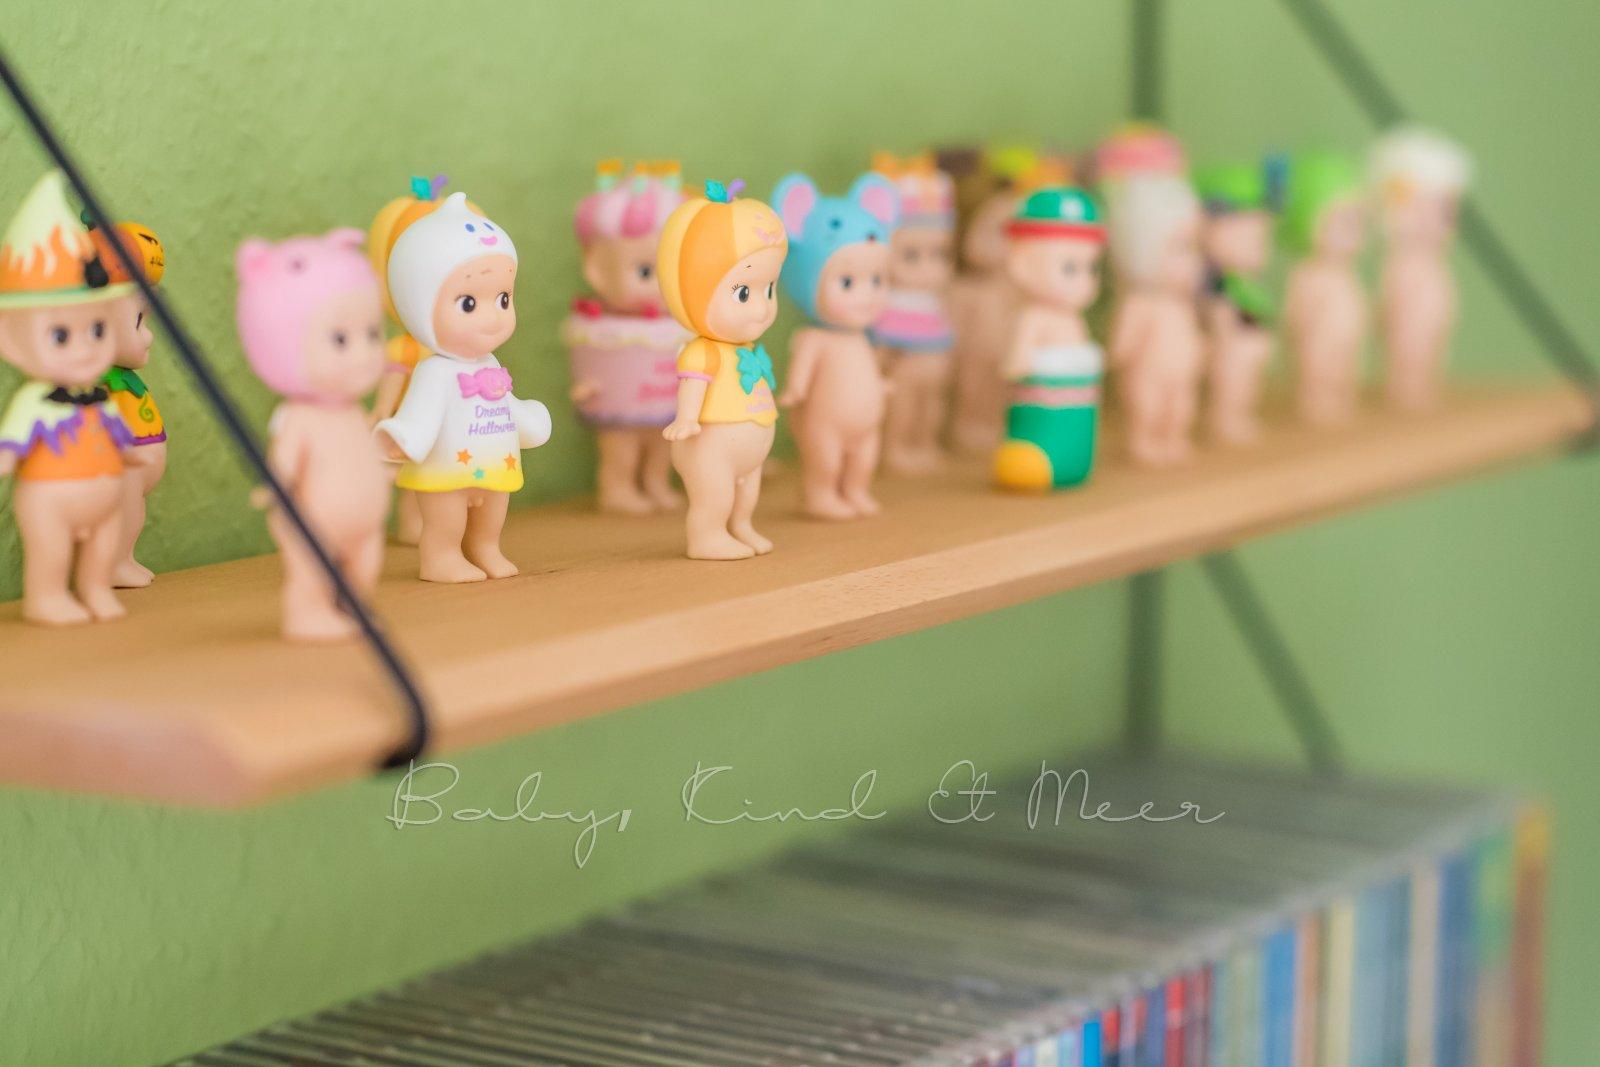 Lottes neues Kinderzimmer babykindundmeer 8